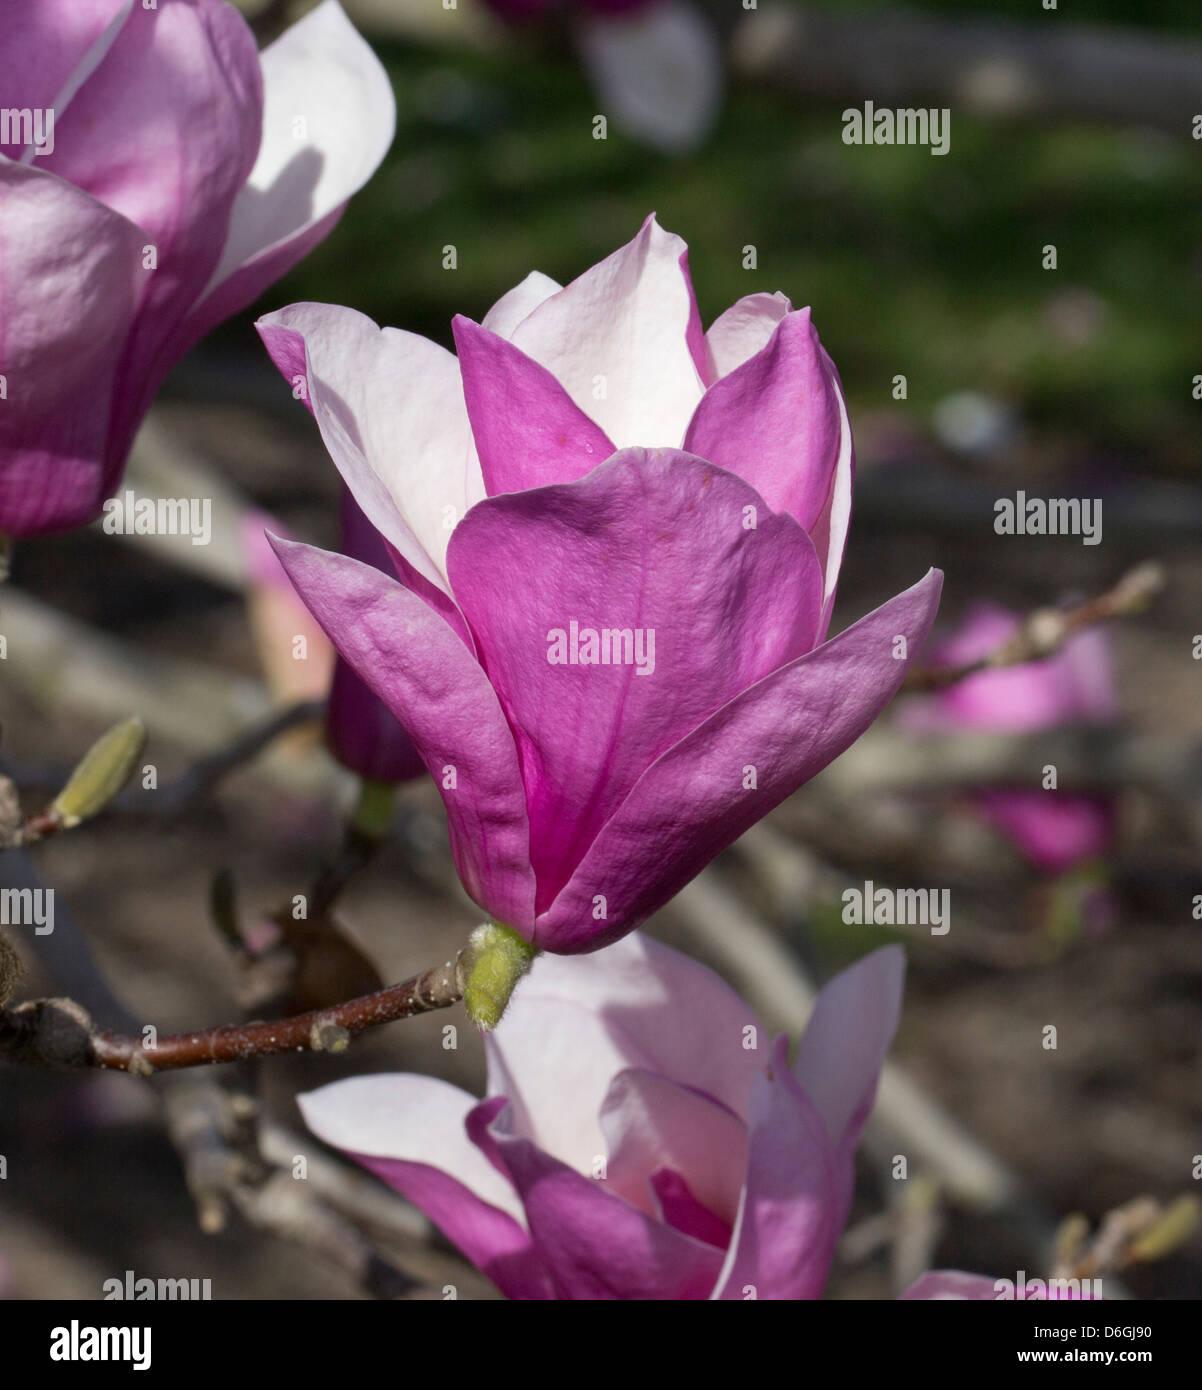 Purple Saucer Magnolia Flower Blossom Stock Photo 55684636 Alamy